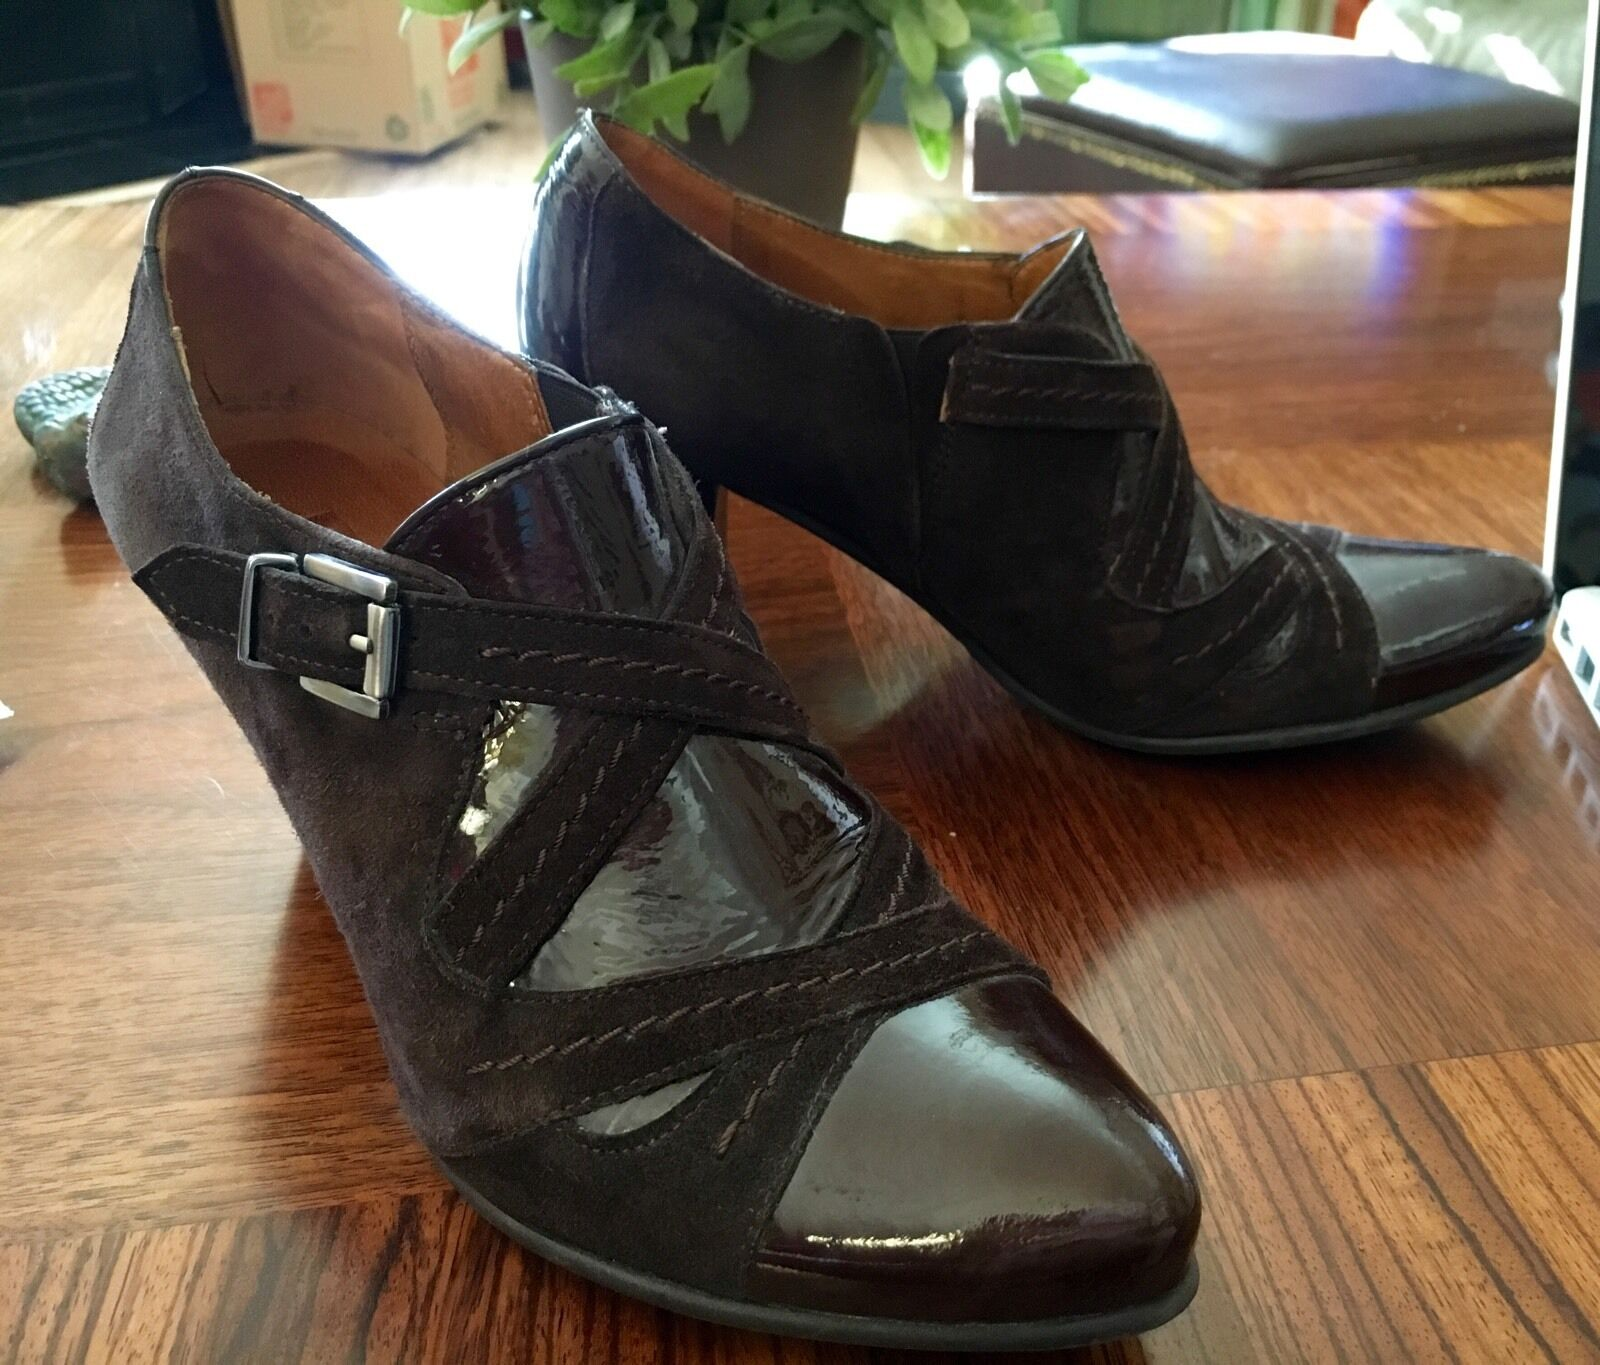 Unique Fidji scarpe Dimensione 37 Made in Portugal Worn Only Once